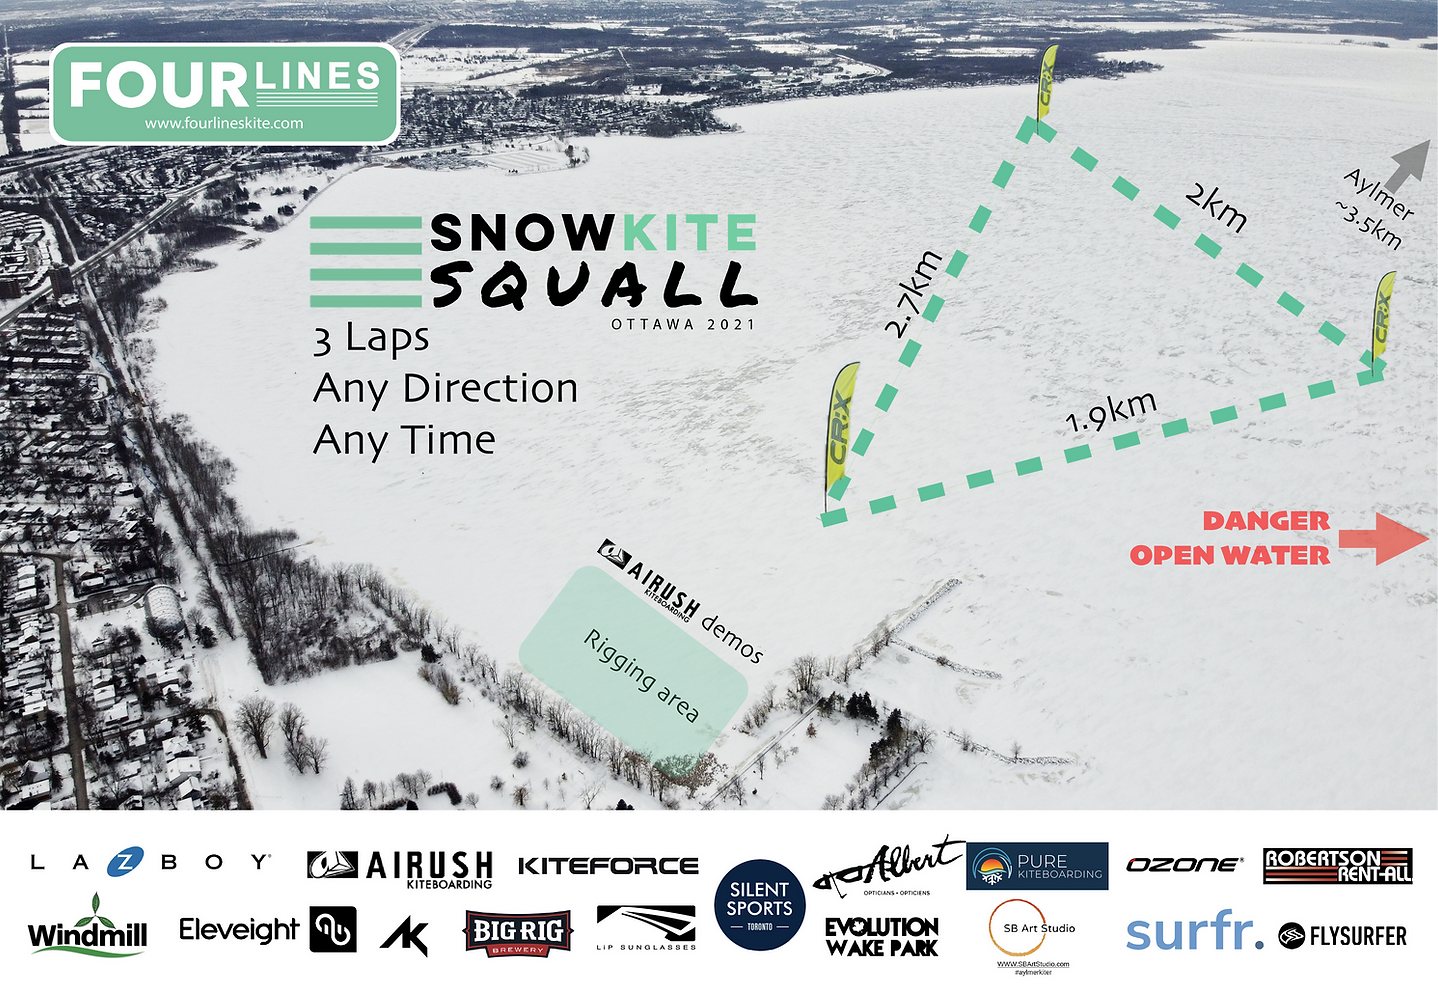 SnowKiteSquall2021Plan-01.png